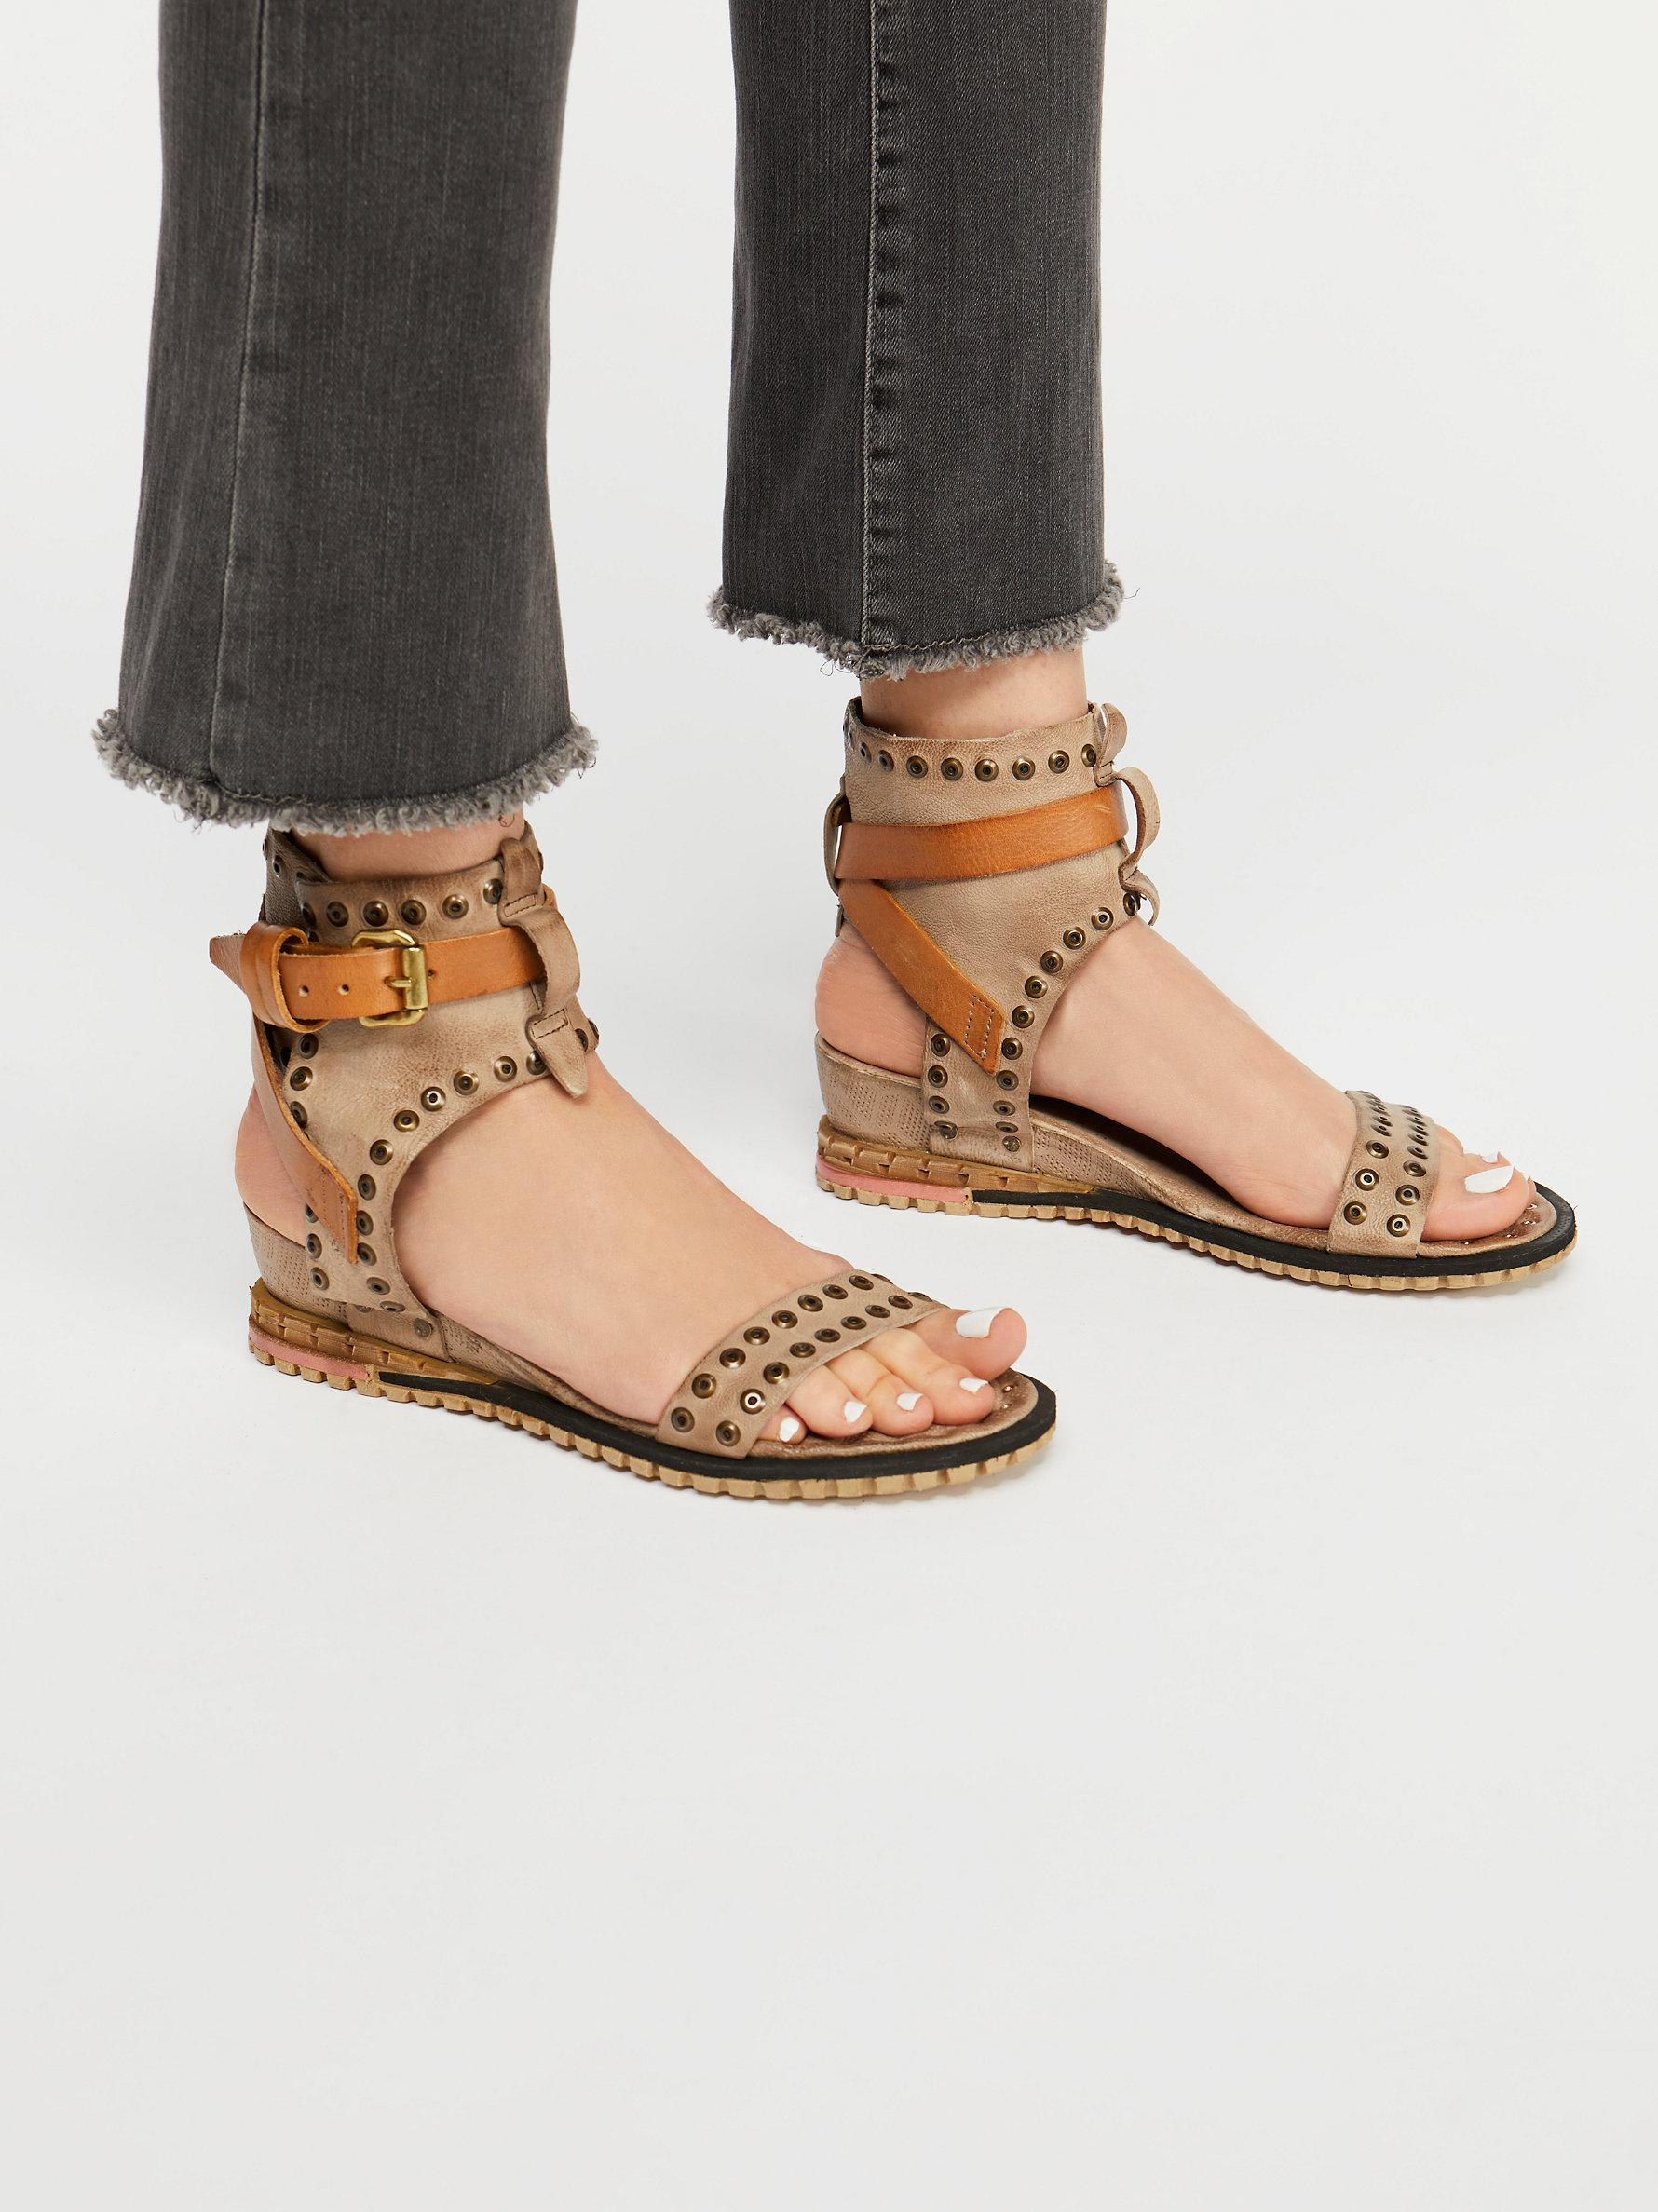 2014d3a50c43 Free People Tessa Mini Wedge Sandal in Gray - Lyst